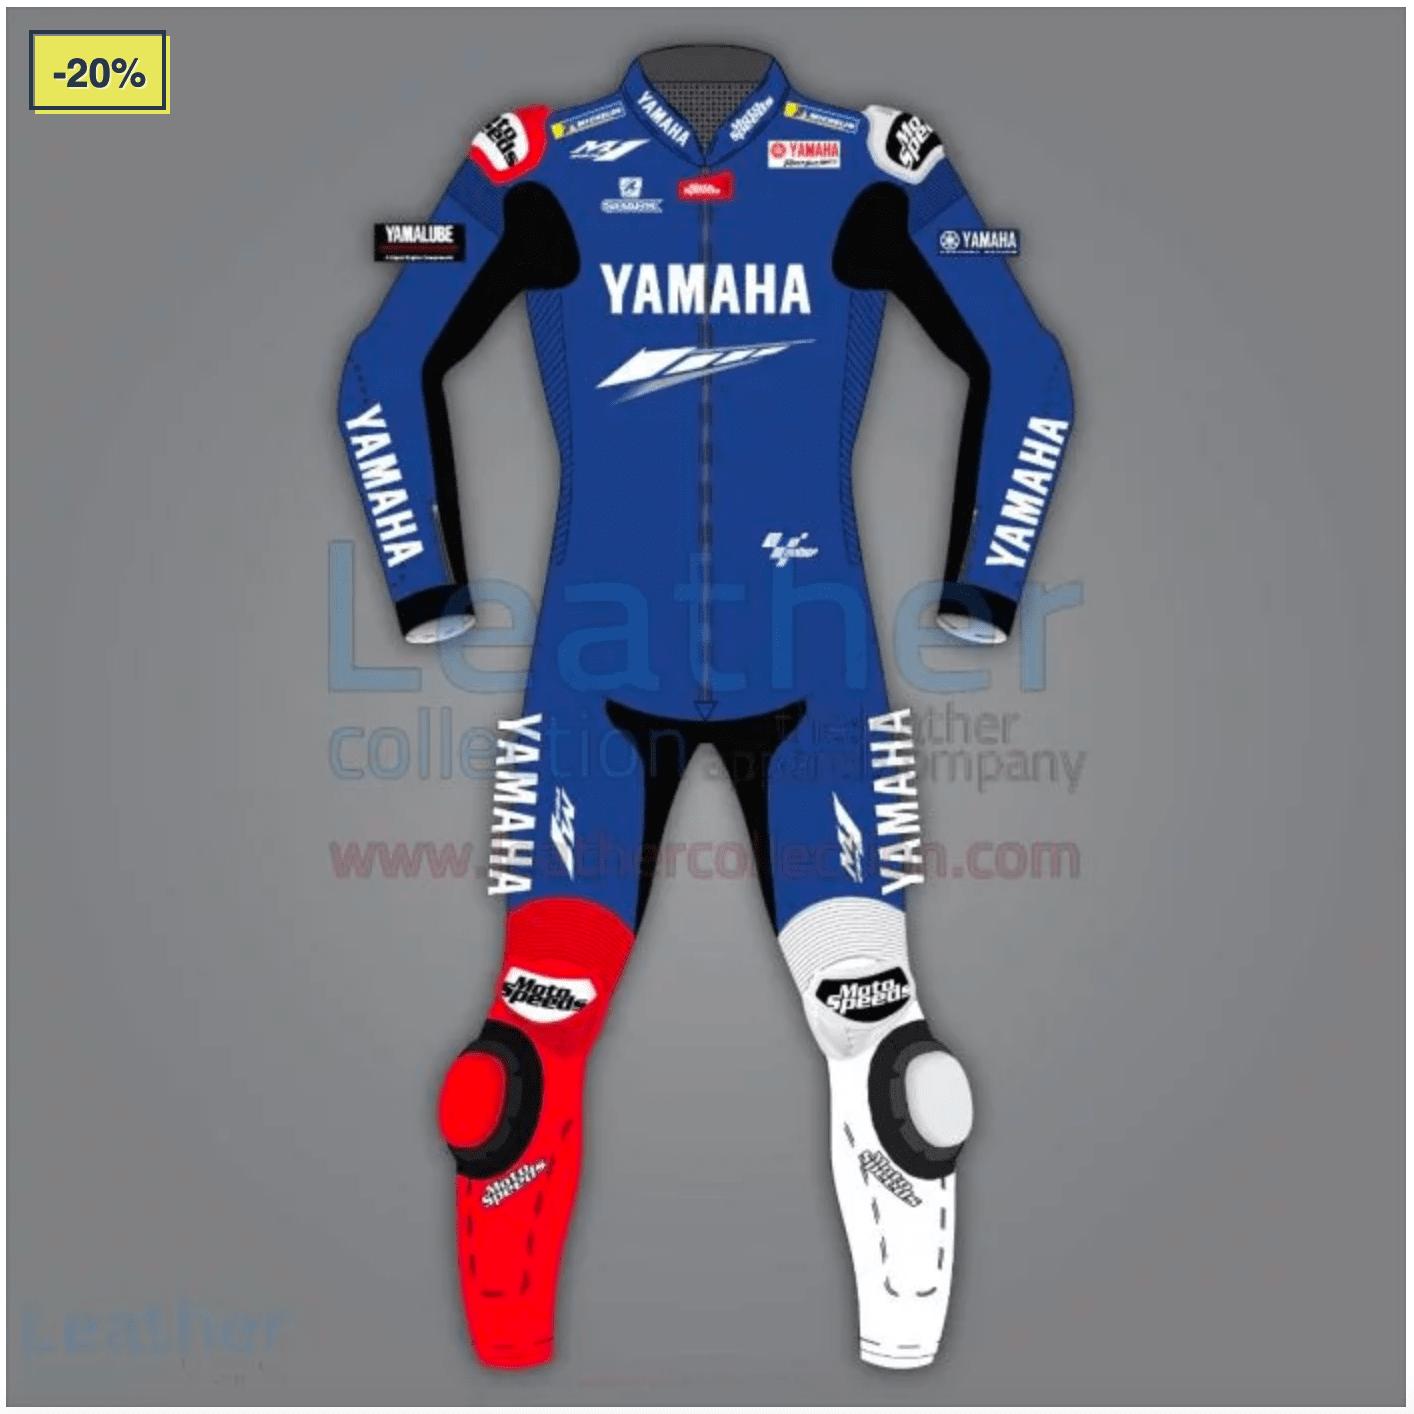 Lorenzo Yamaha Leathers MotoGP 2020 in 2020 (With